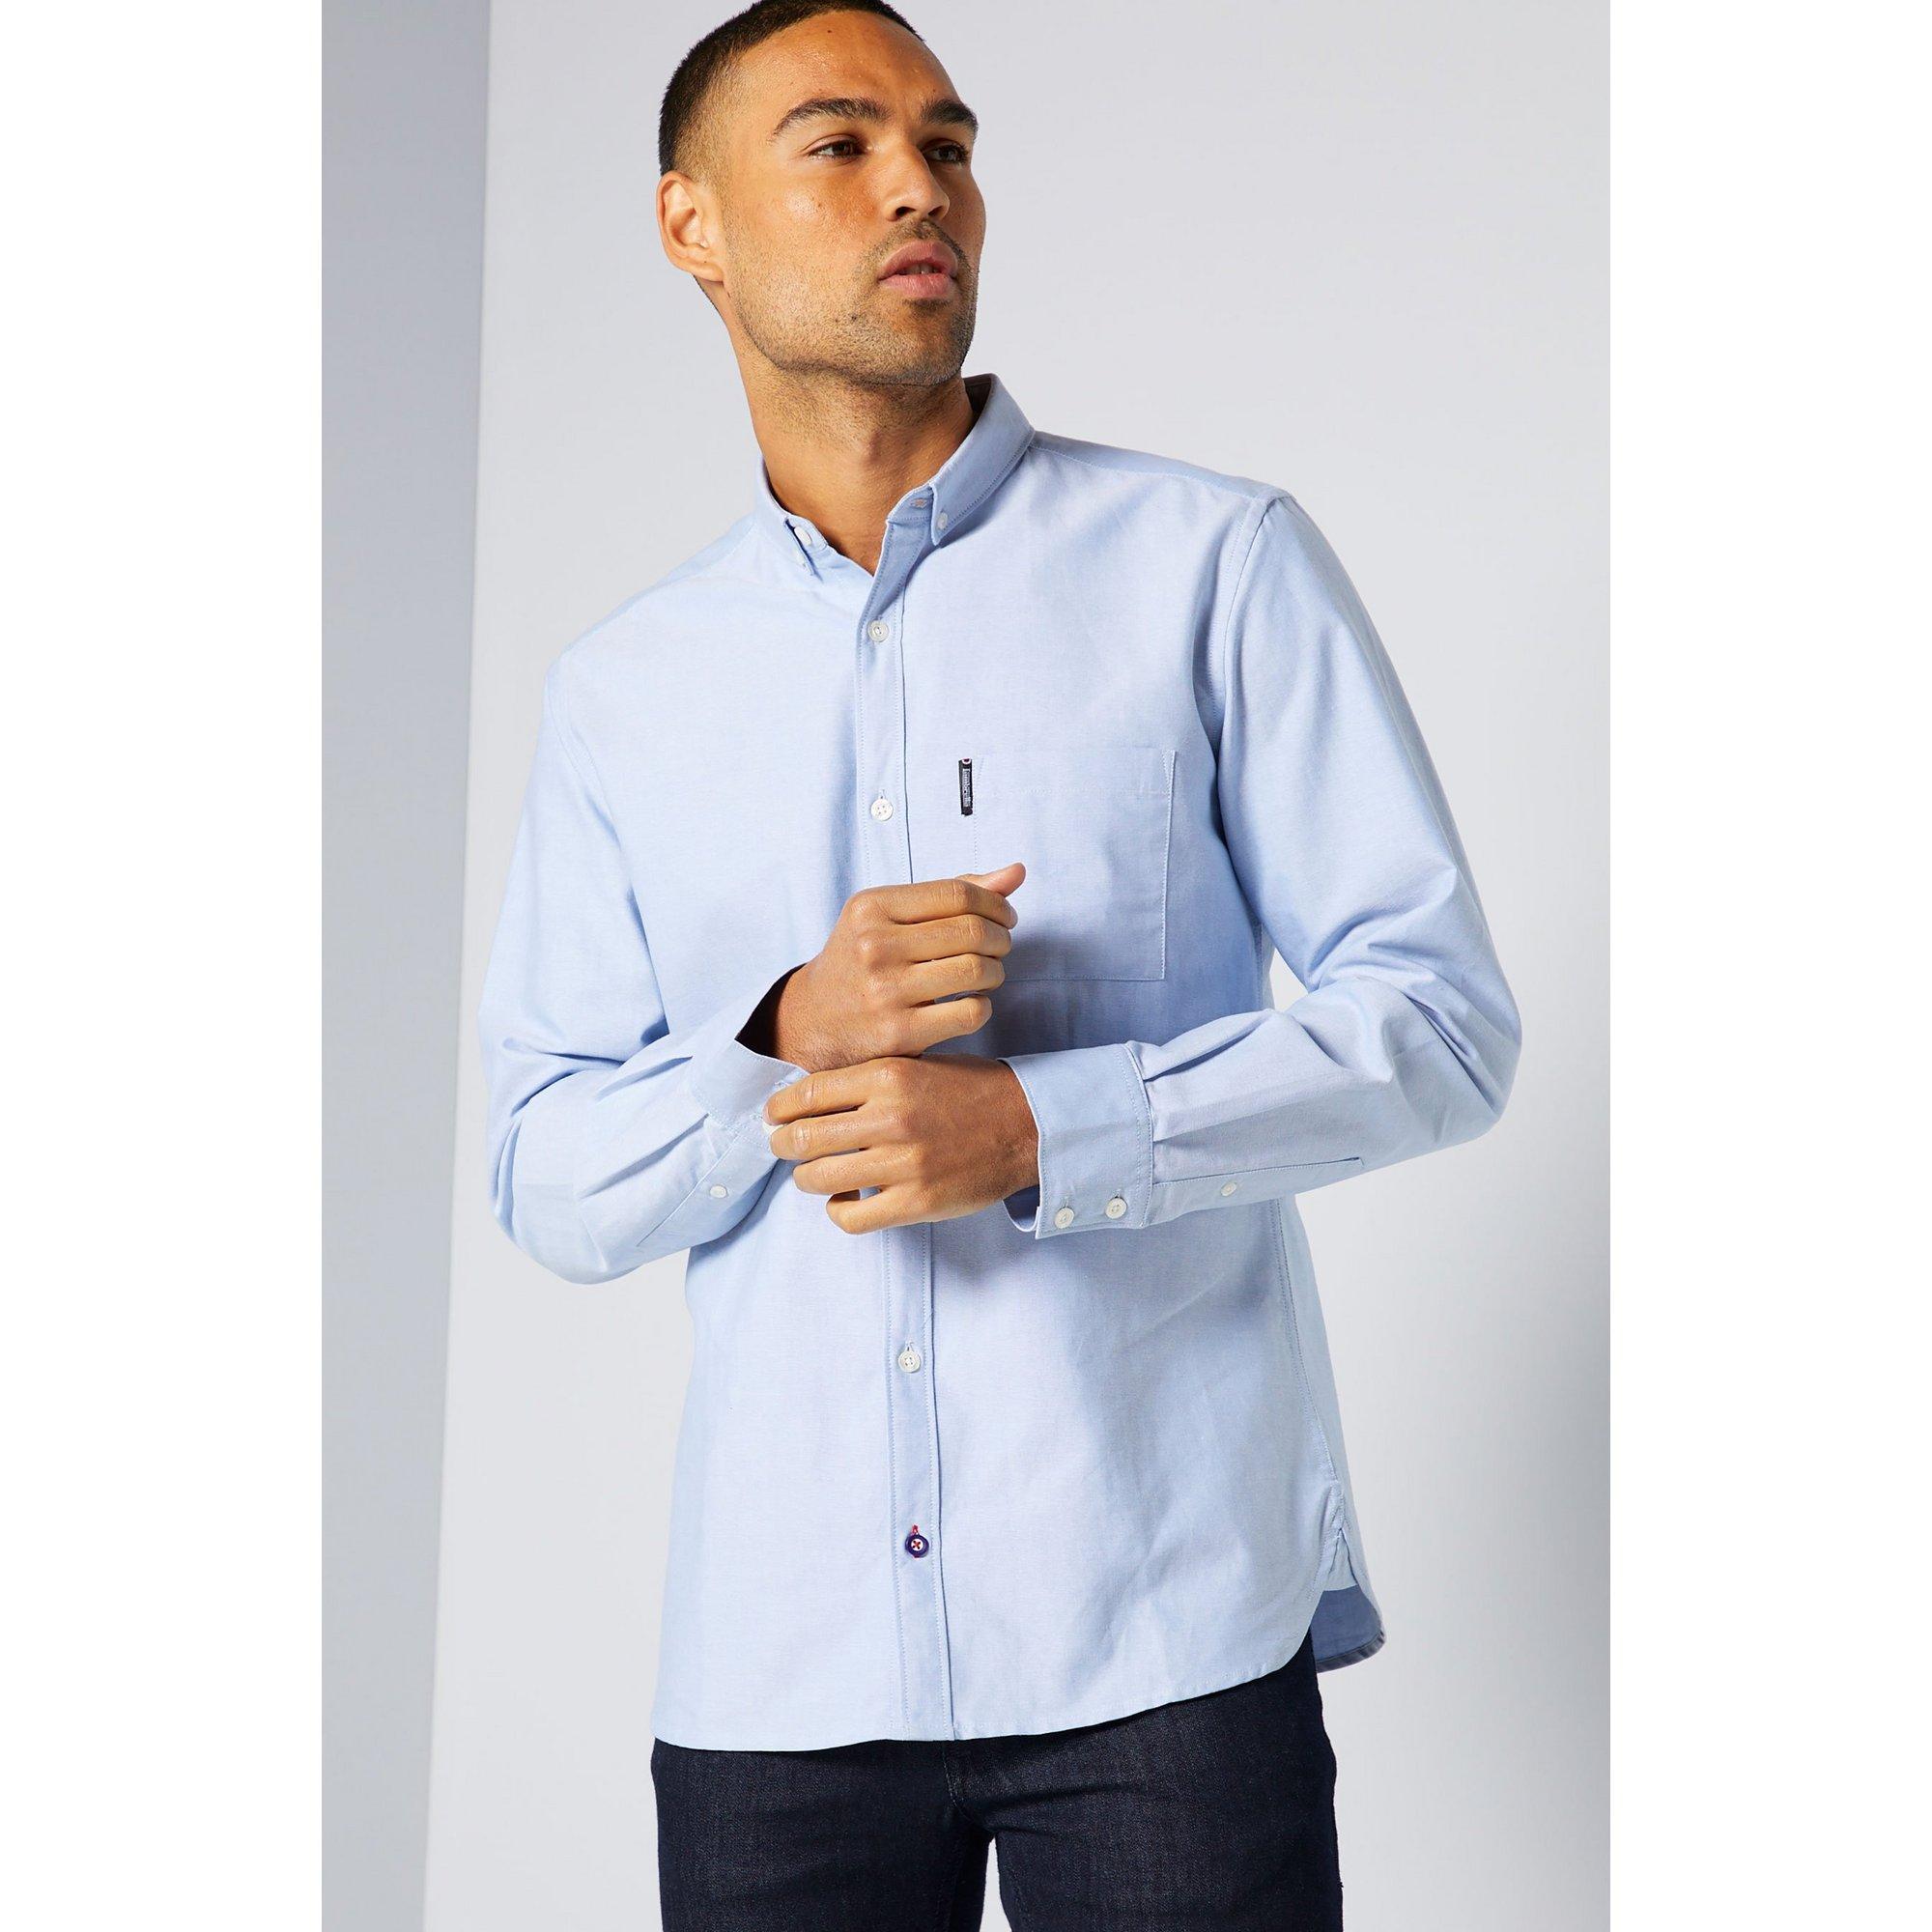 Image of Lambretta Light Blue Oxford Shirt